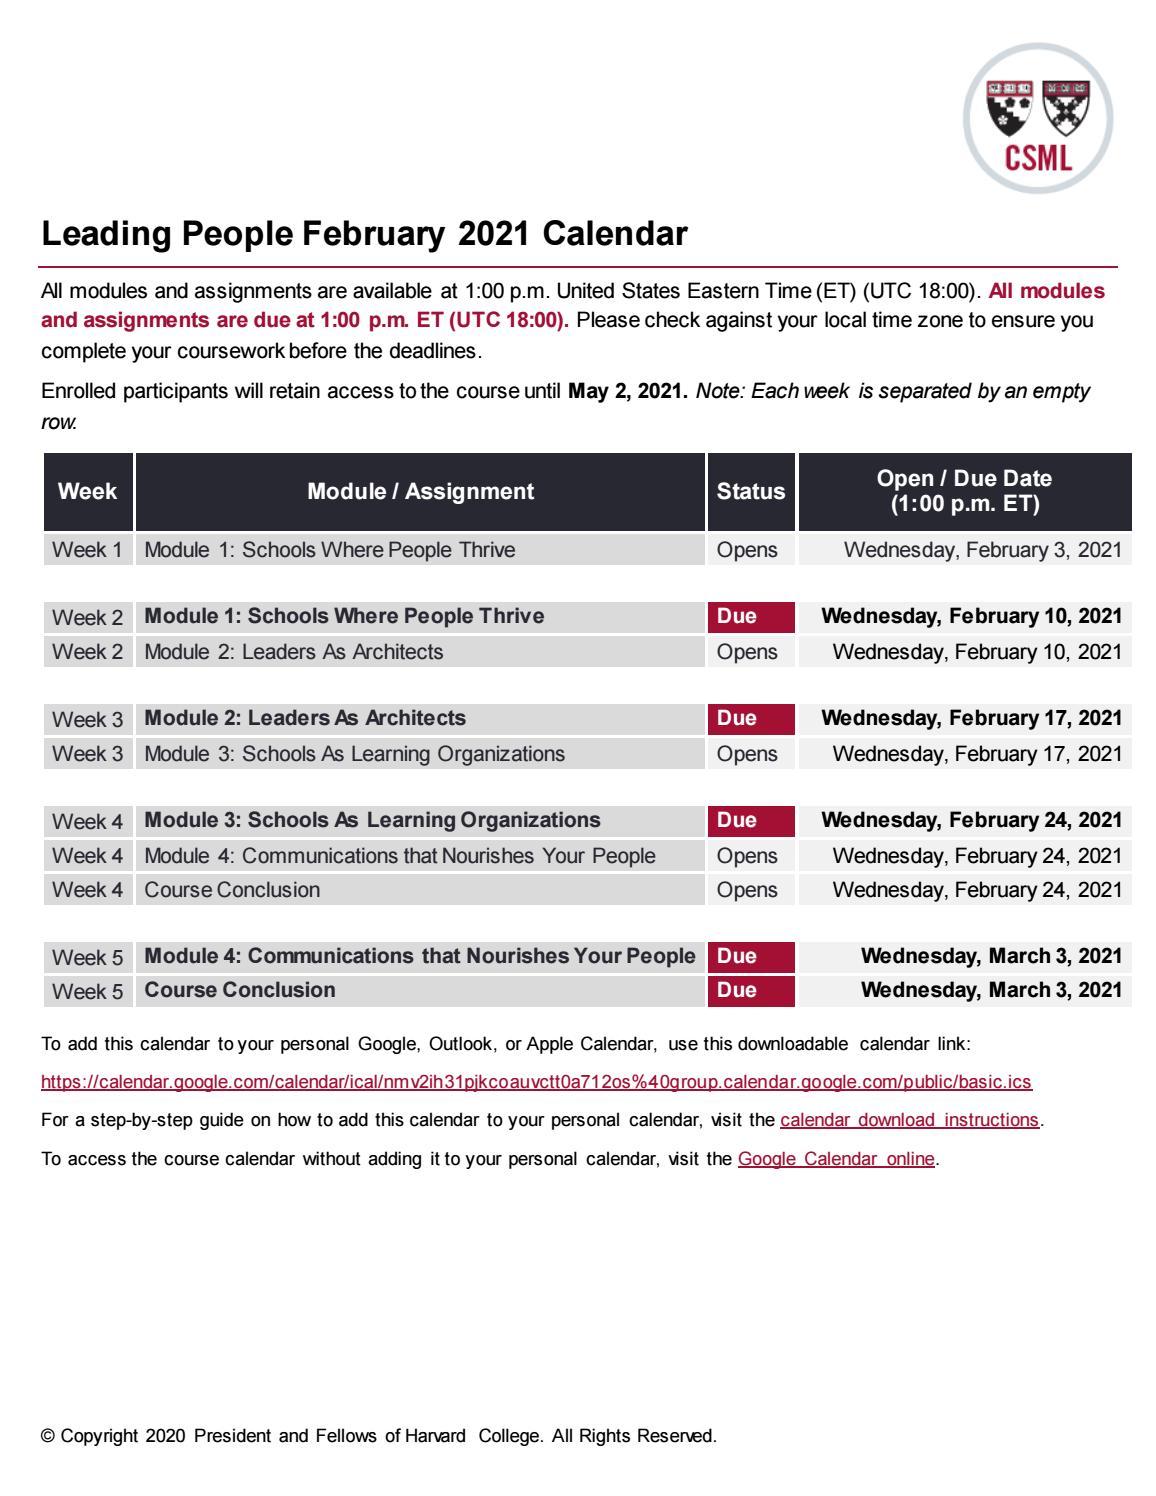 Utc 2021 Calendar Certificate in School Management and Leadership: Leading People